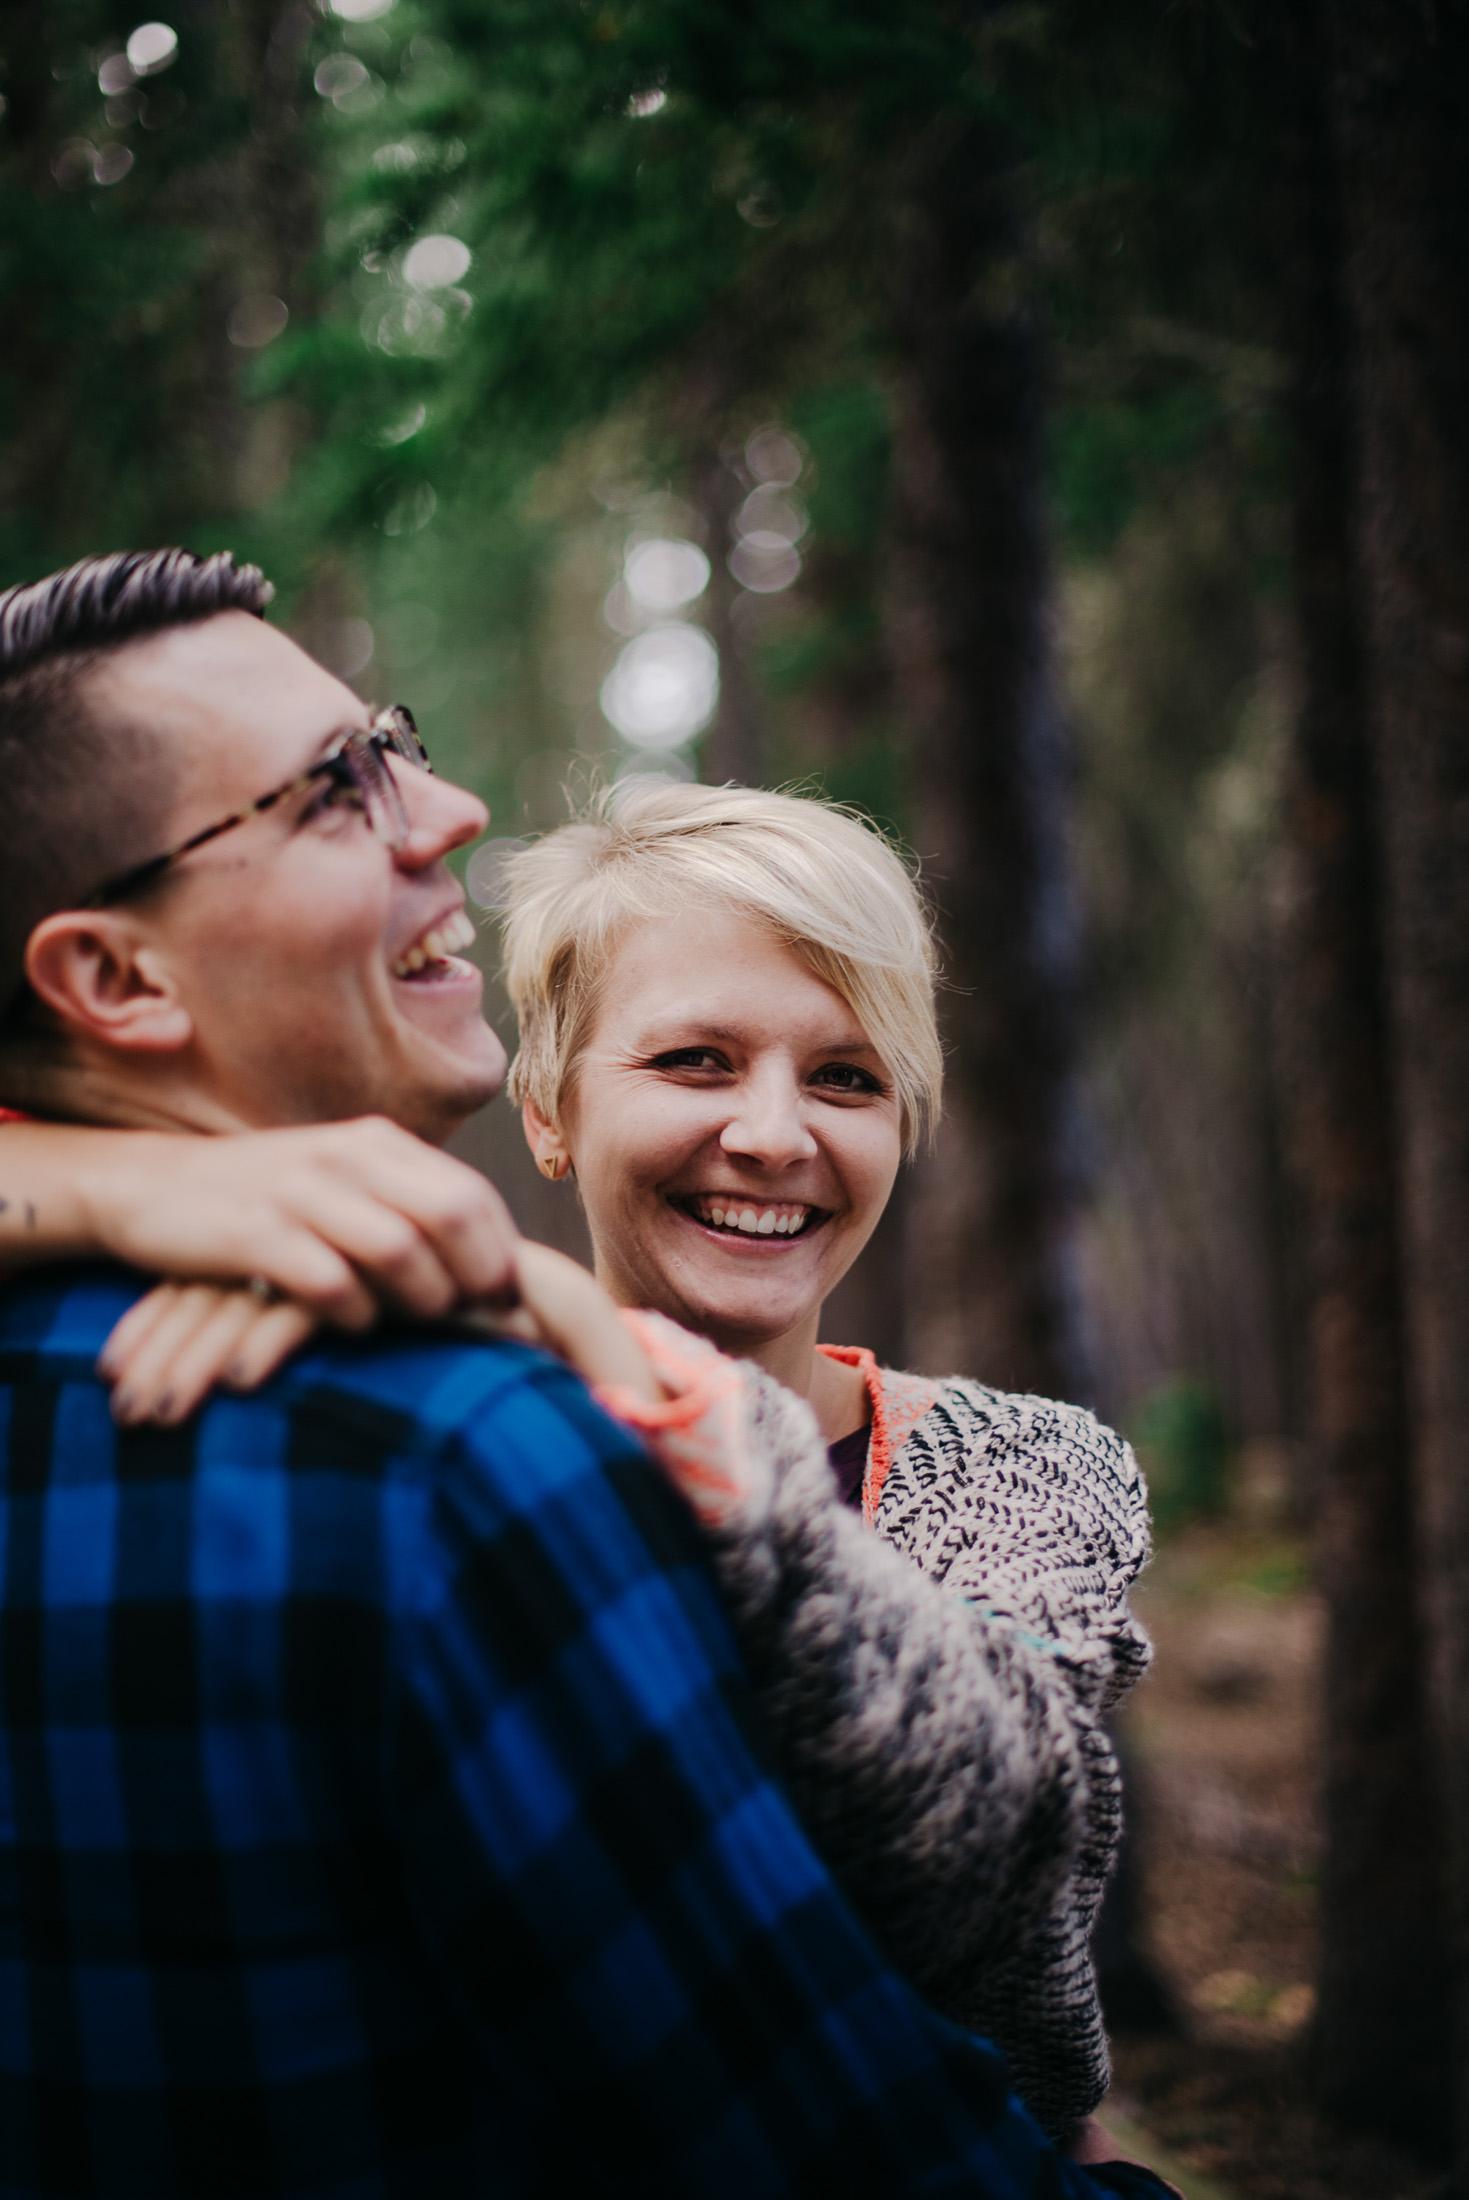 32-25couple-anniversary-engagement-photographer-colorado-Jeremy&Lindsay-Tosh-August2017-0047.jpg